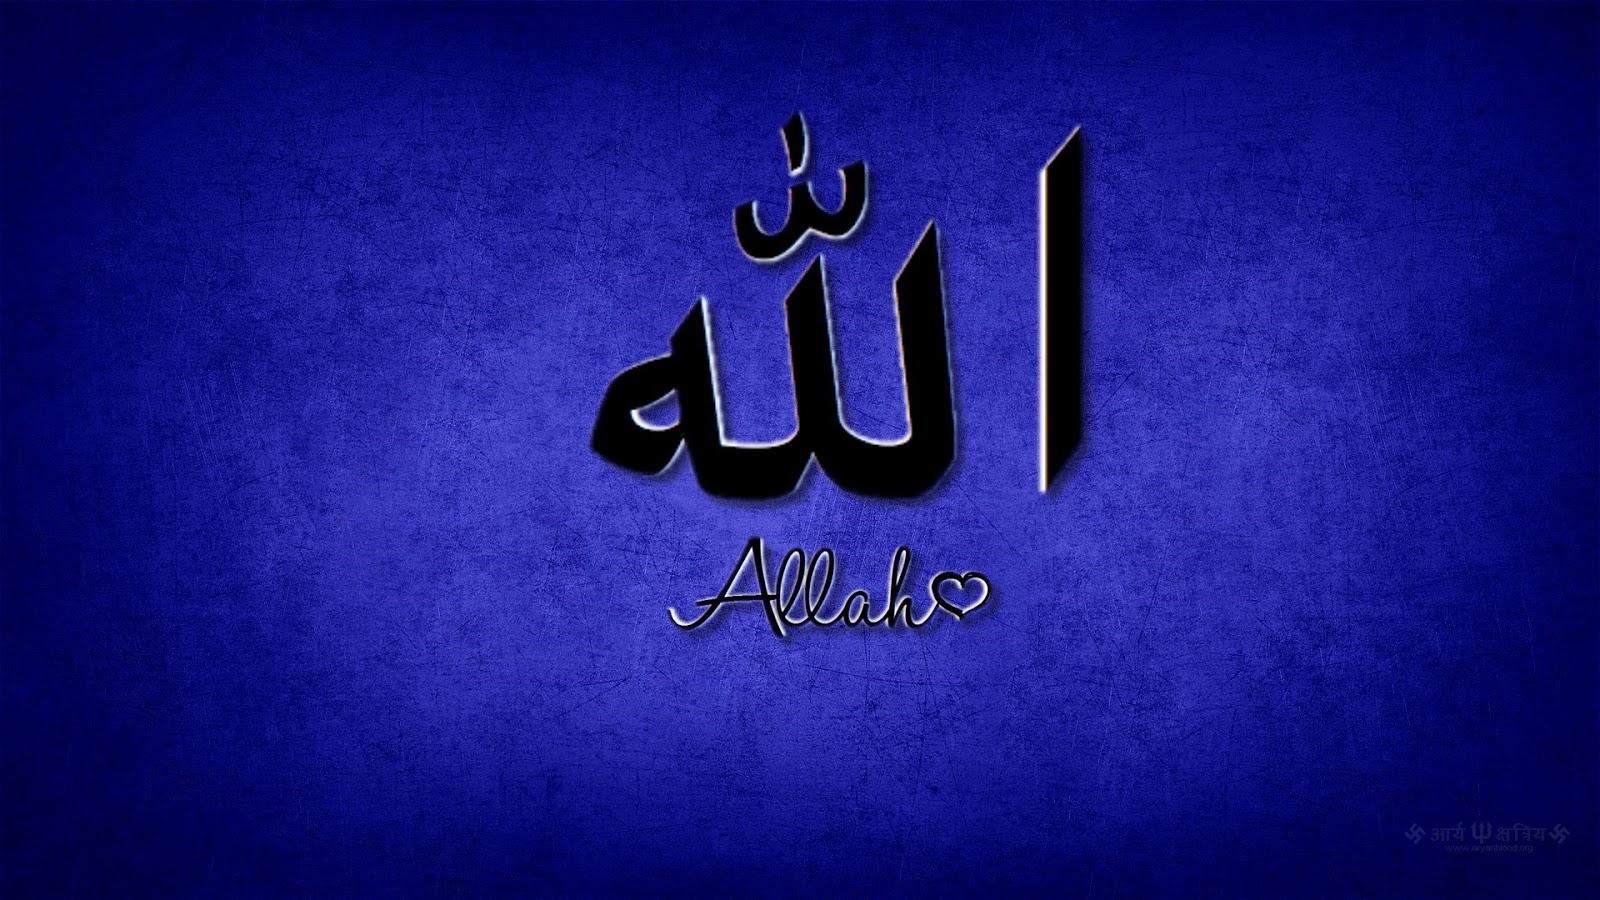 Muhammad Nouman Ali sheroz Awais iqbal Talha Mohsin Riaz: best allah wallpapers  allah ...